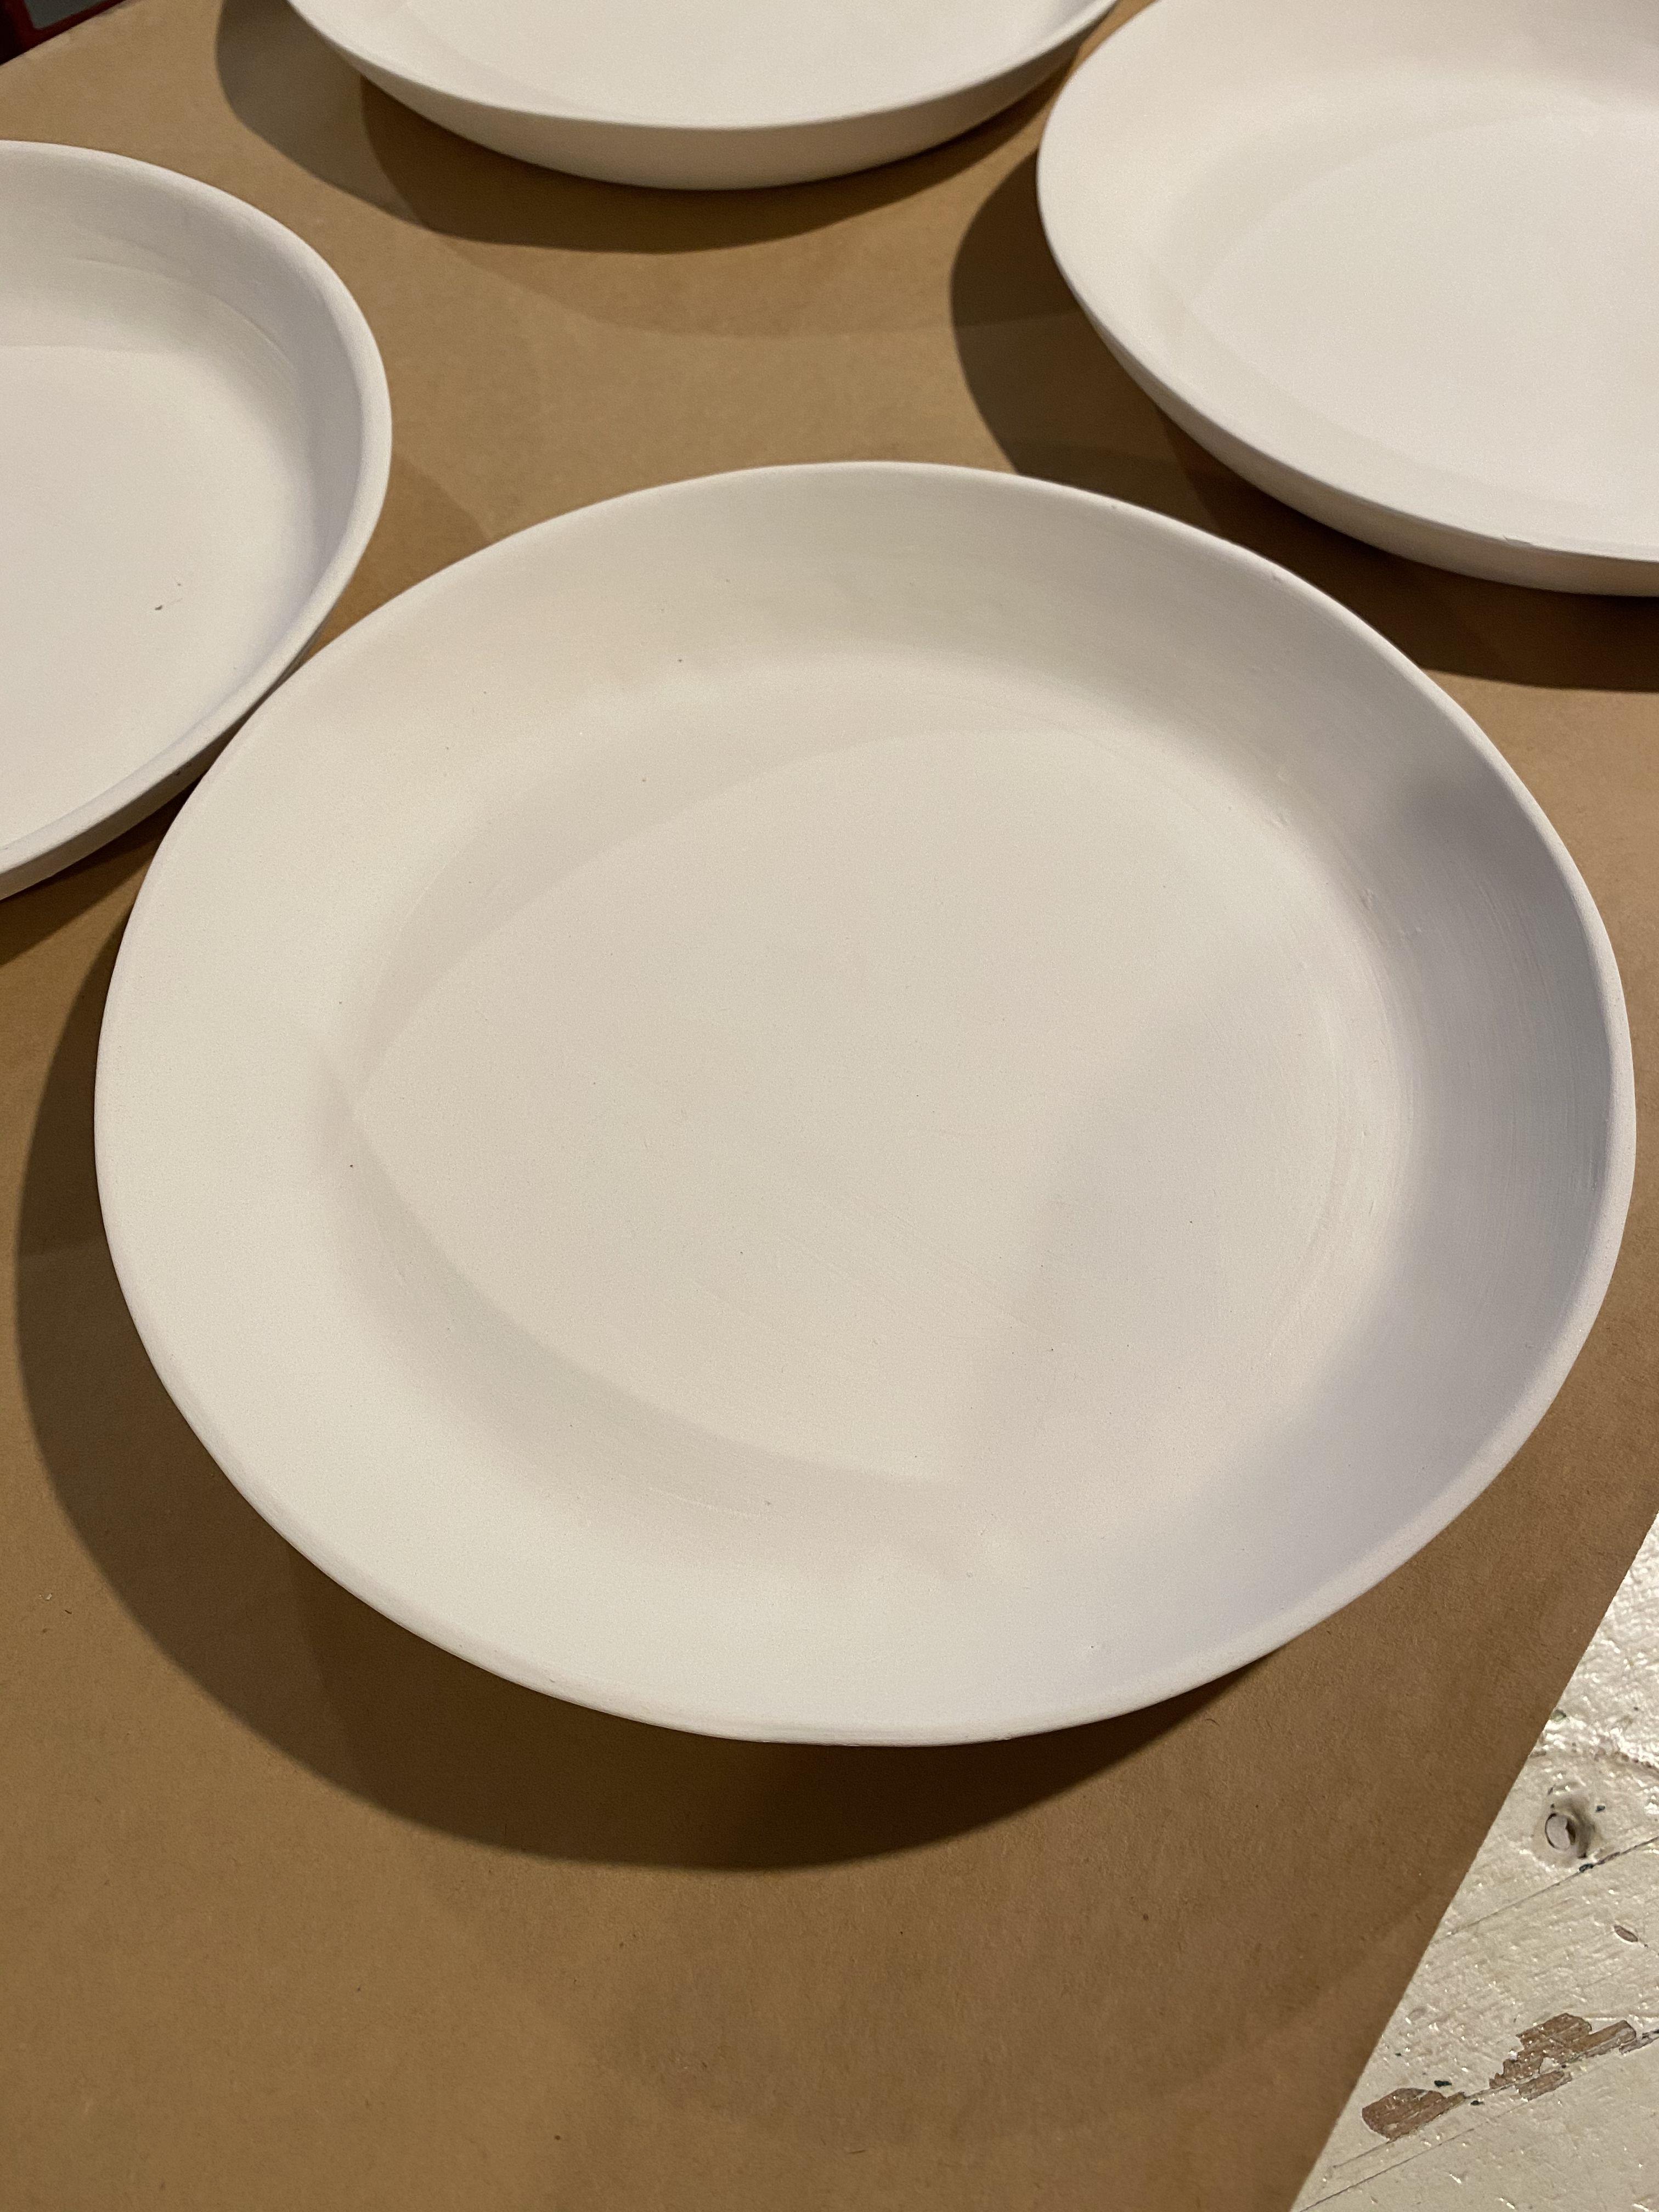 #ceramics #handbuiltceramics #kiikojack #beautyproducts #clay #handmade